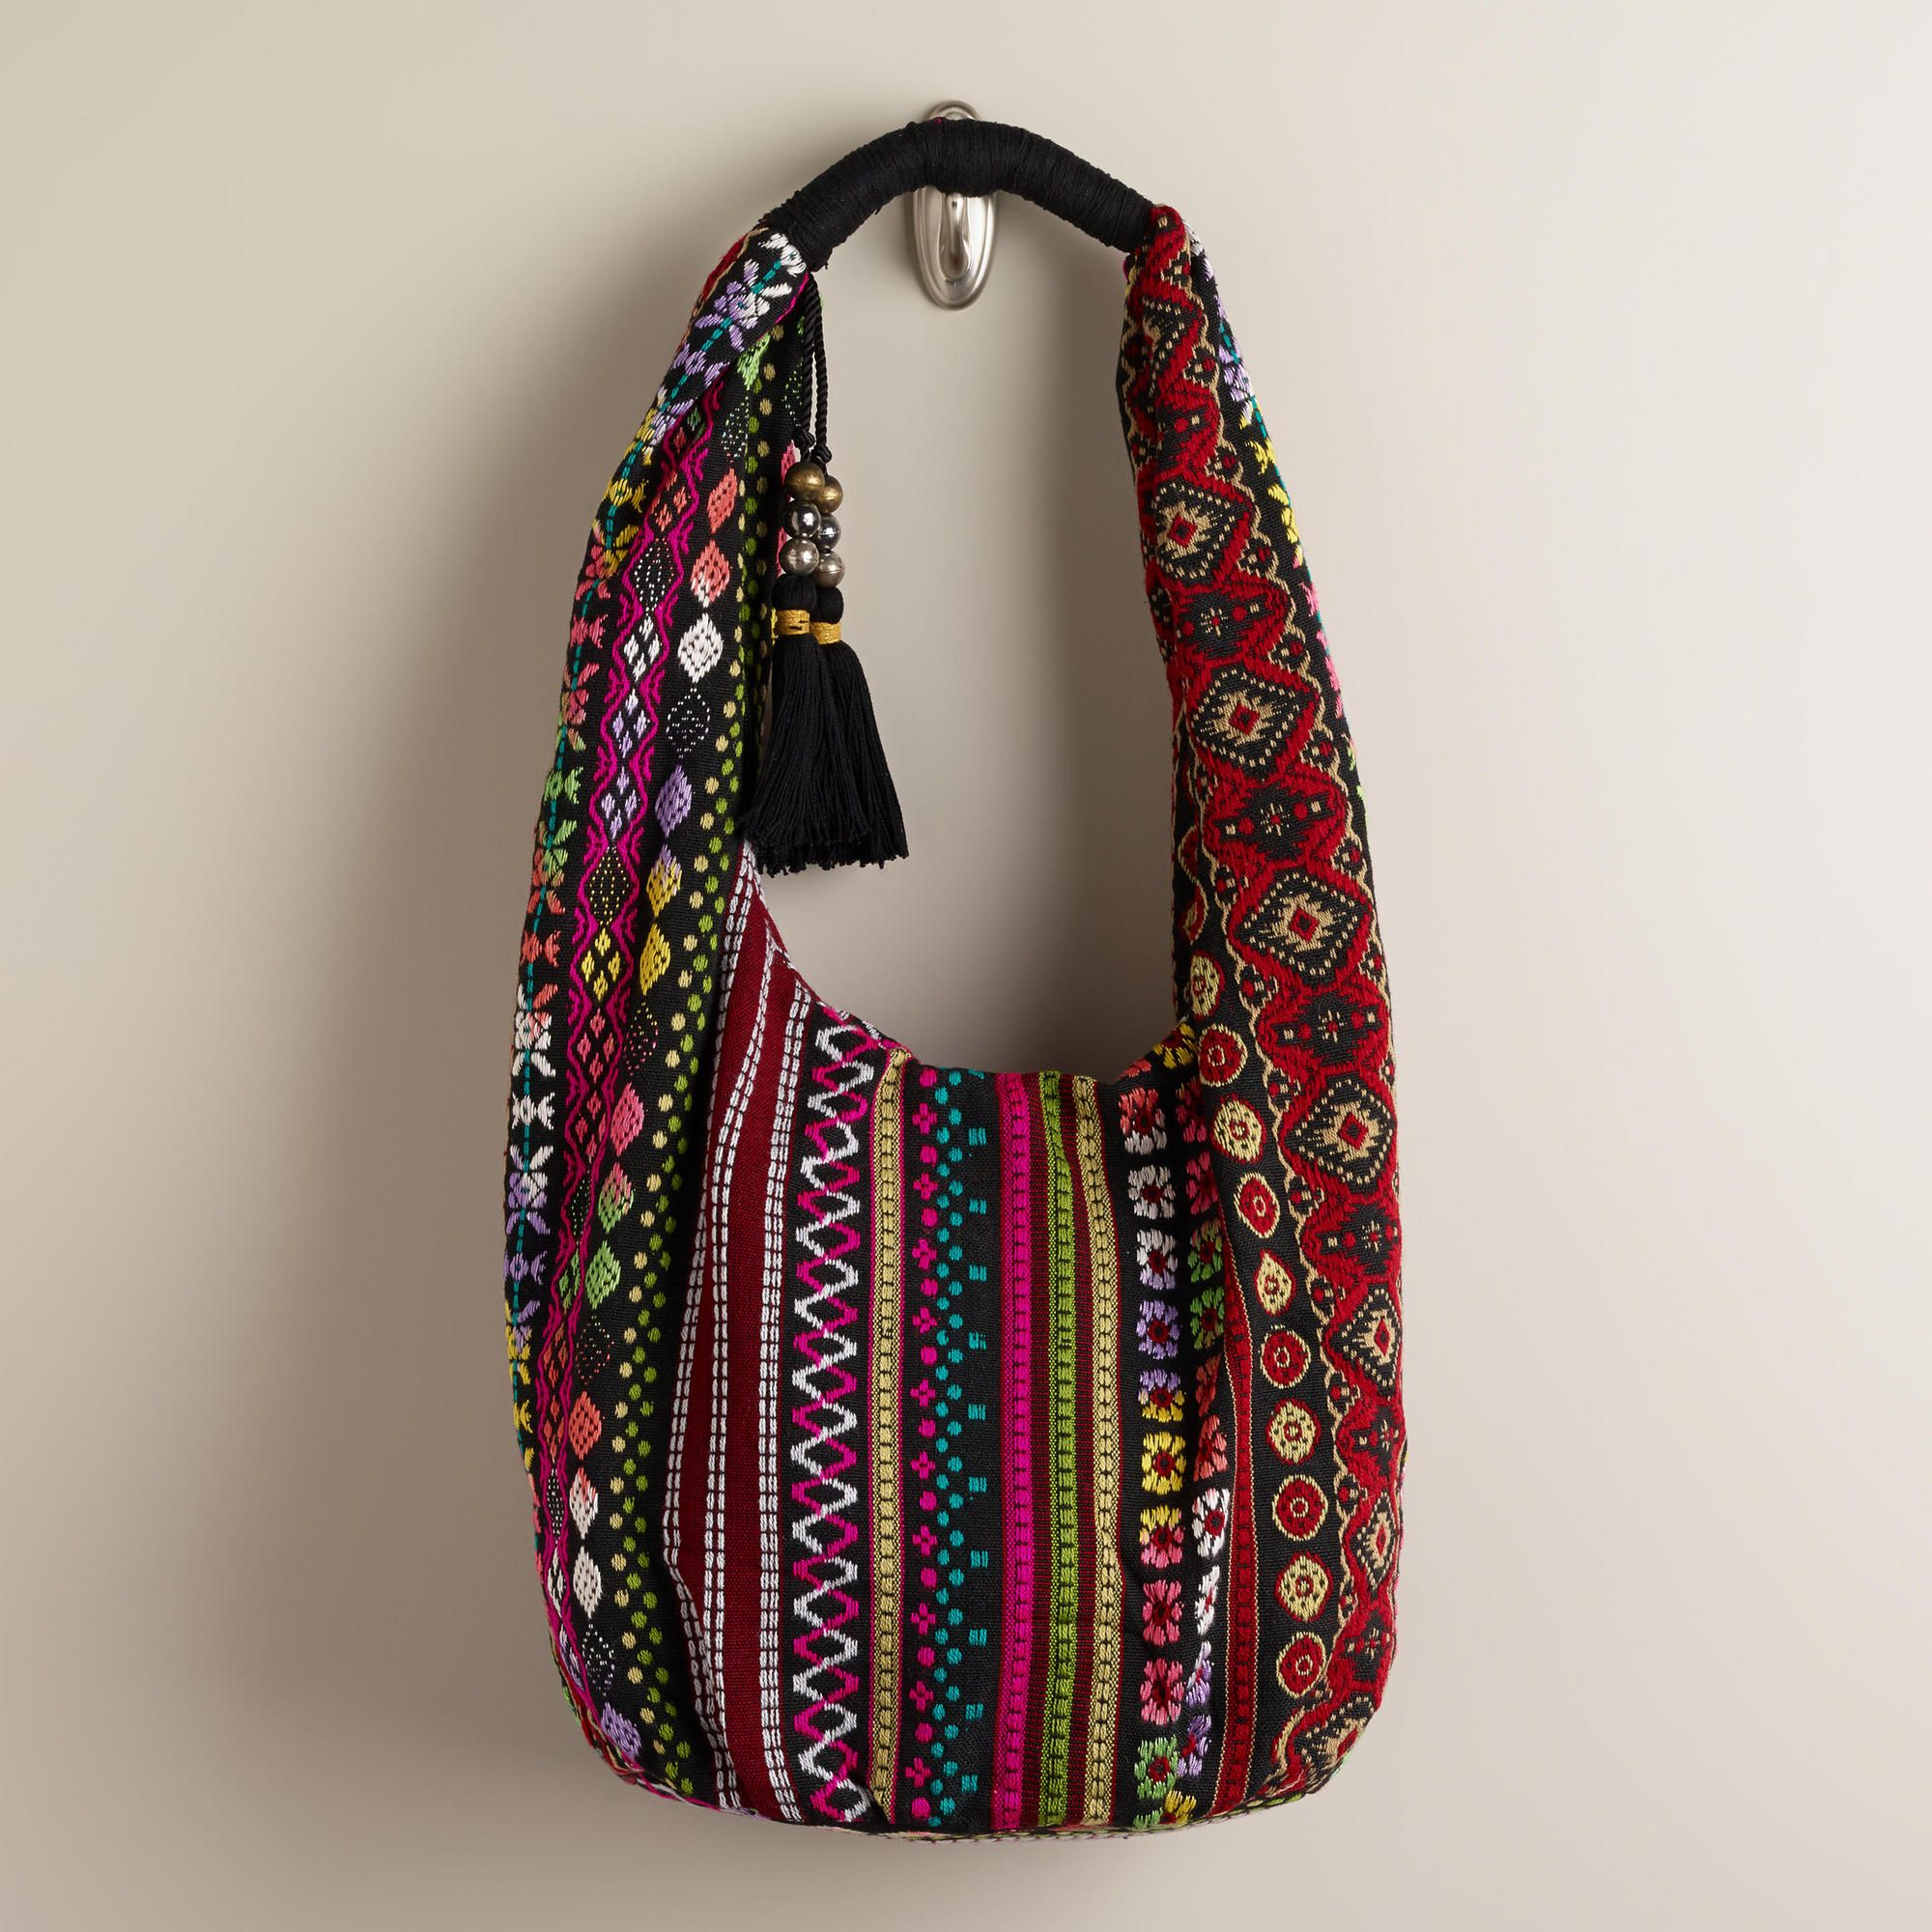 511e067209 Oversized Woven Hobo Bag